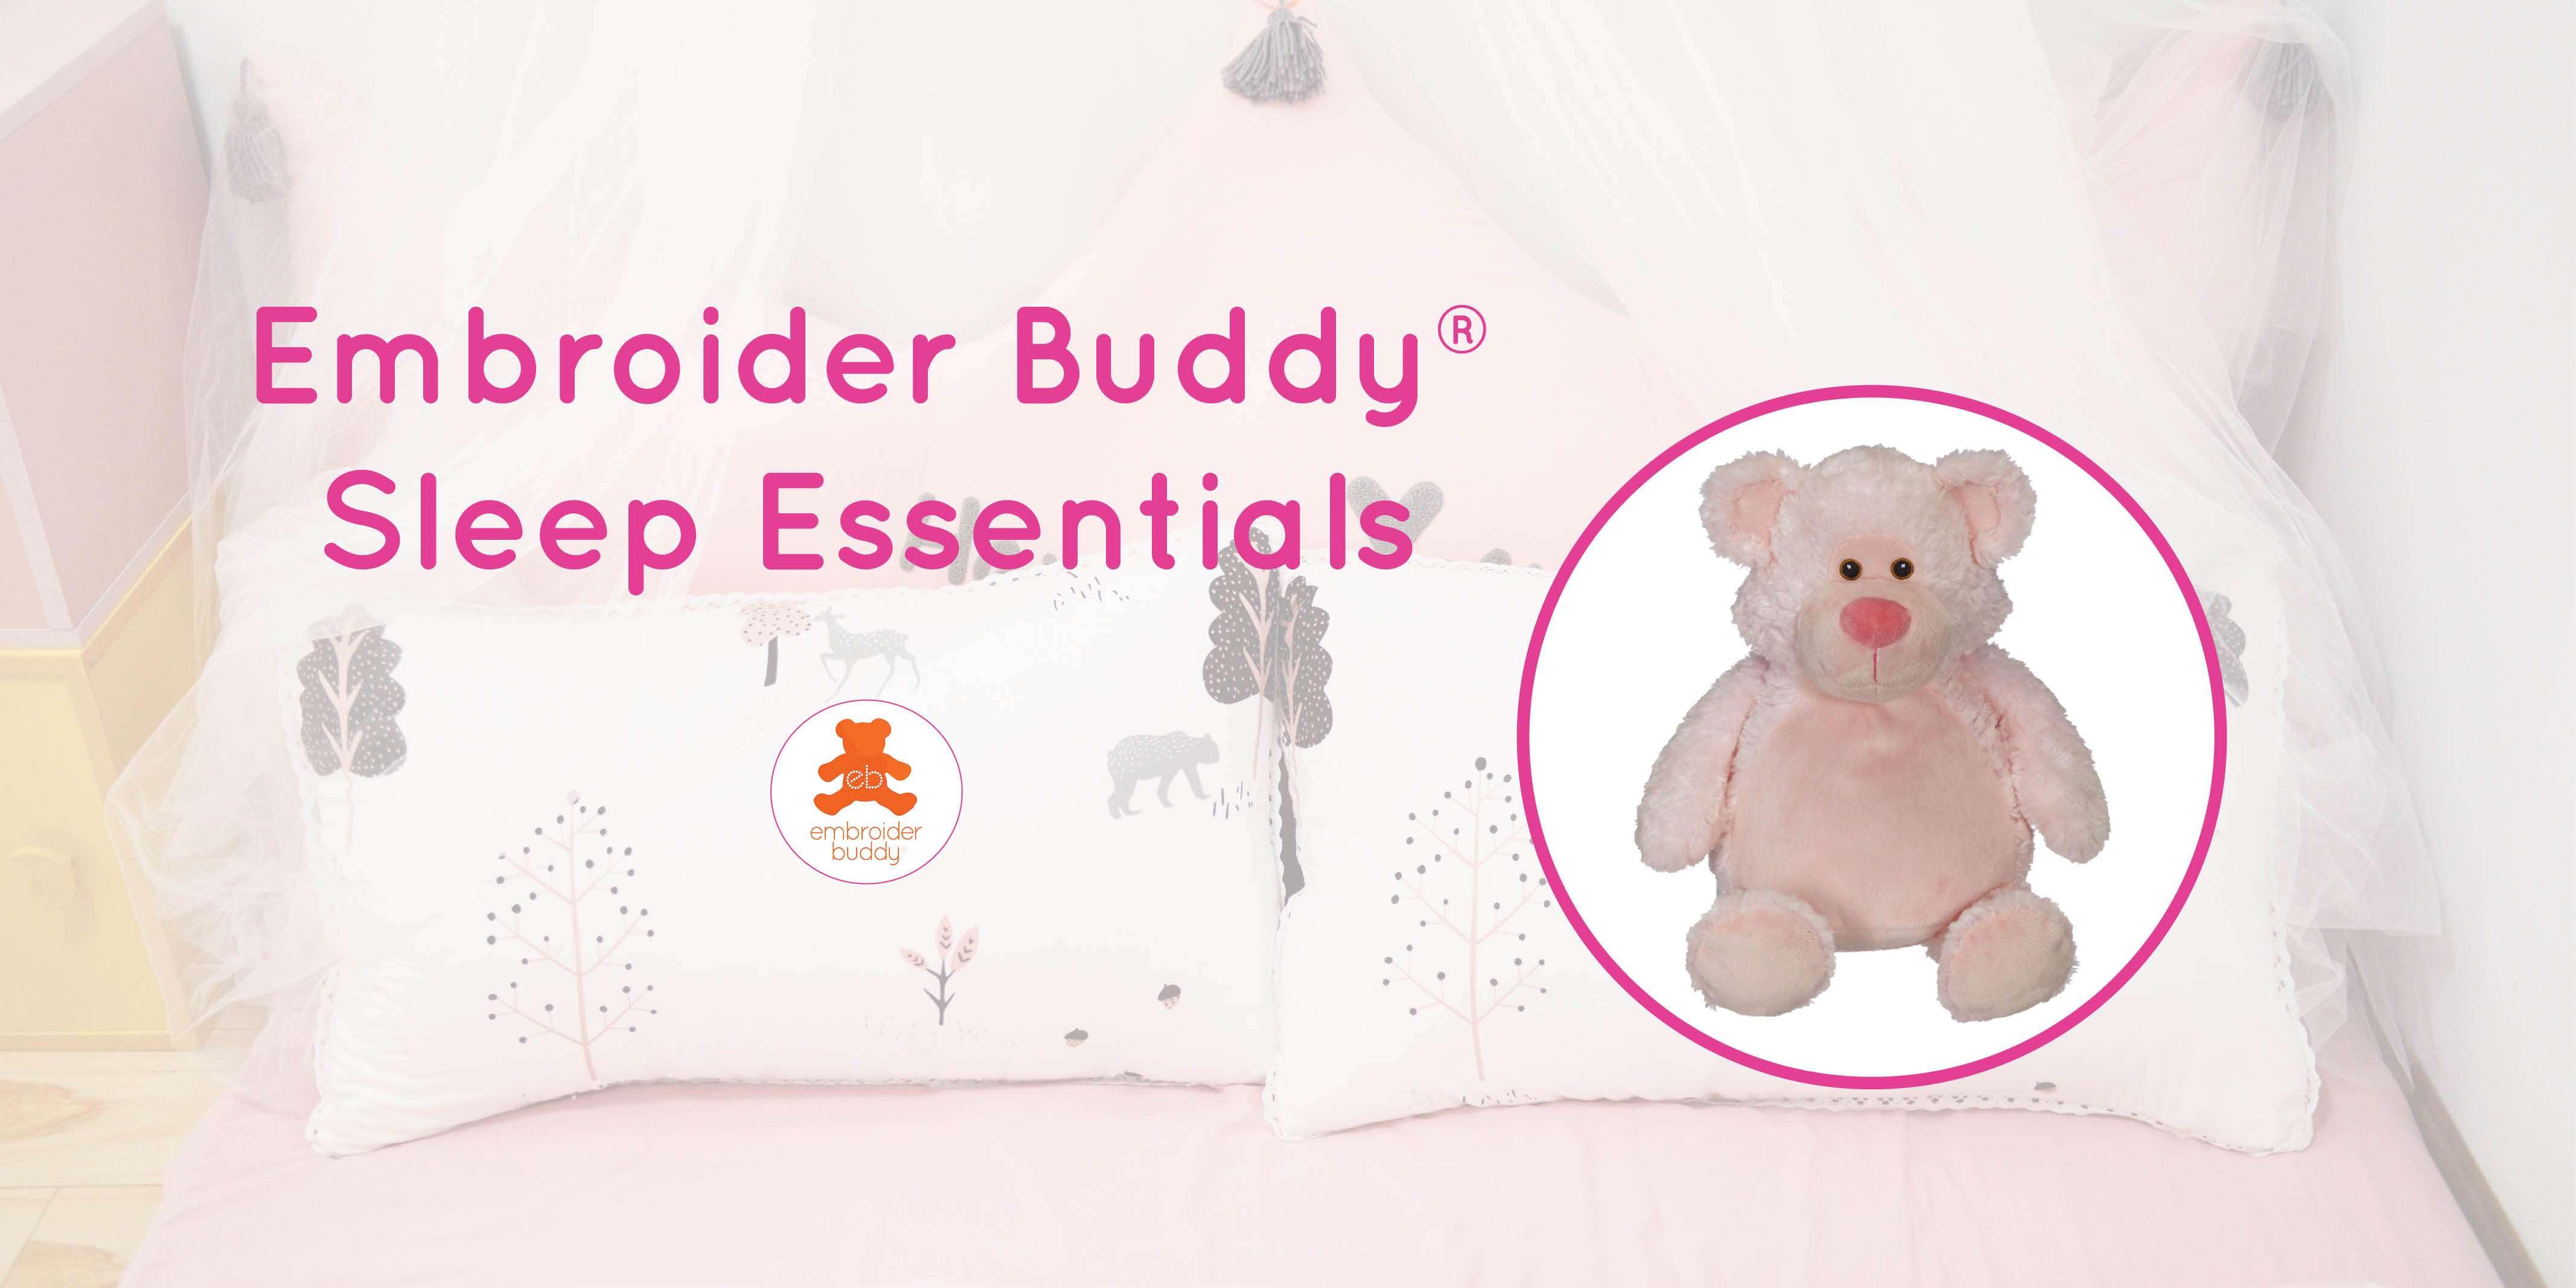 Embroider buddy Sleep Essentials